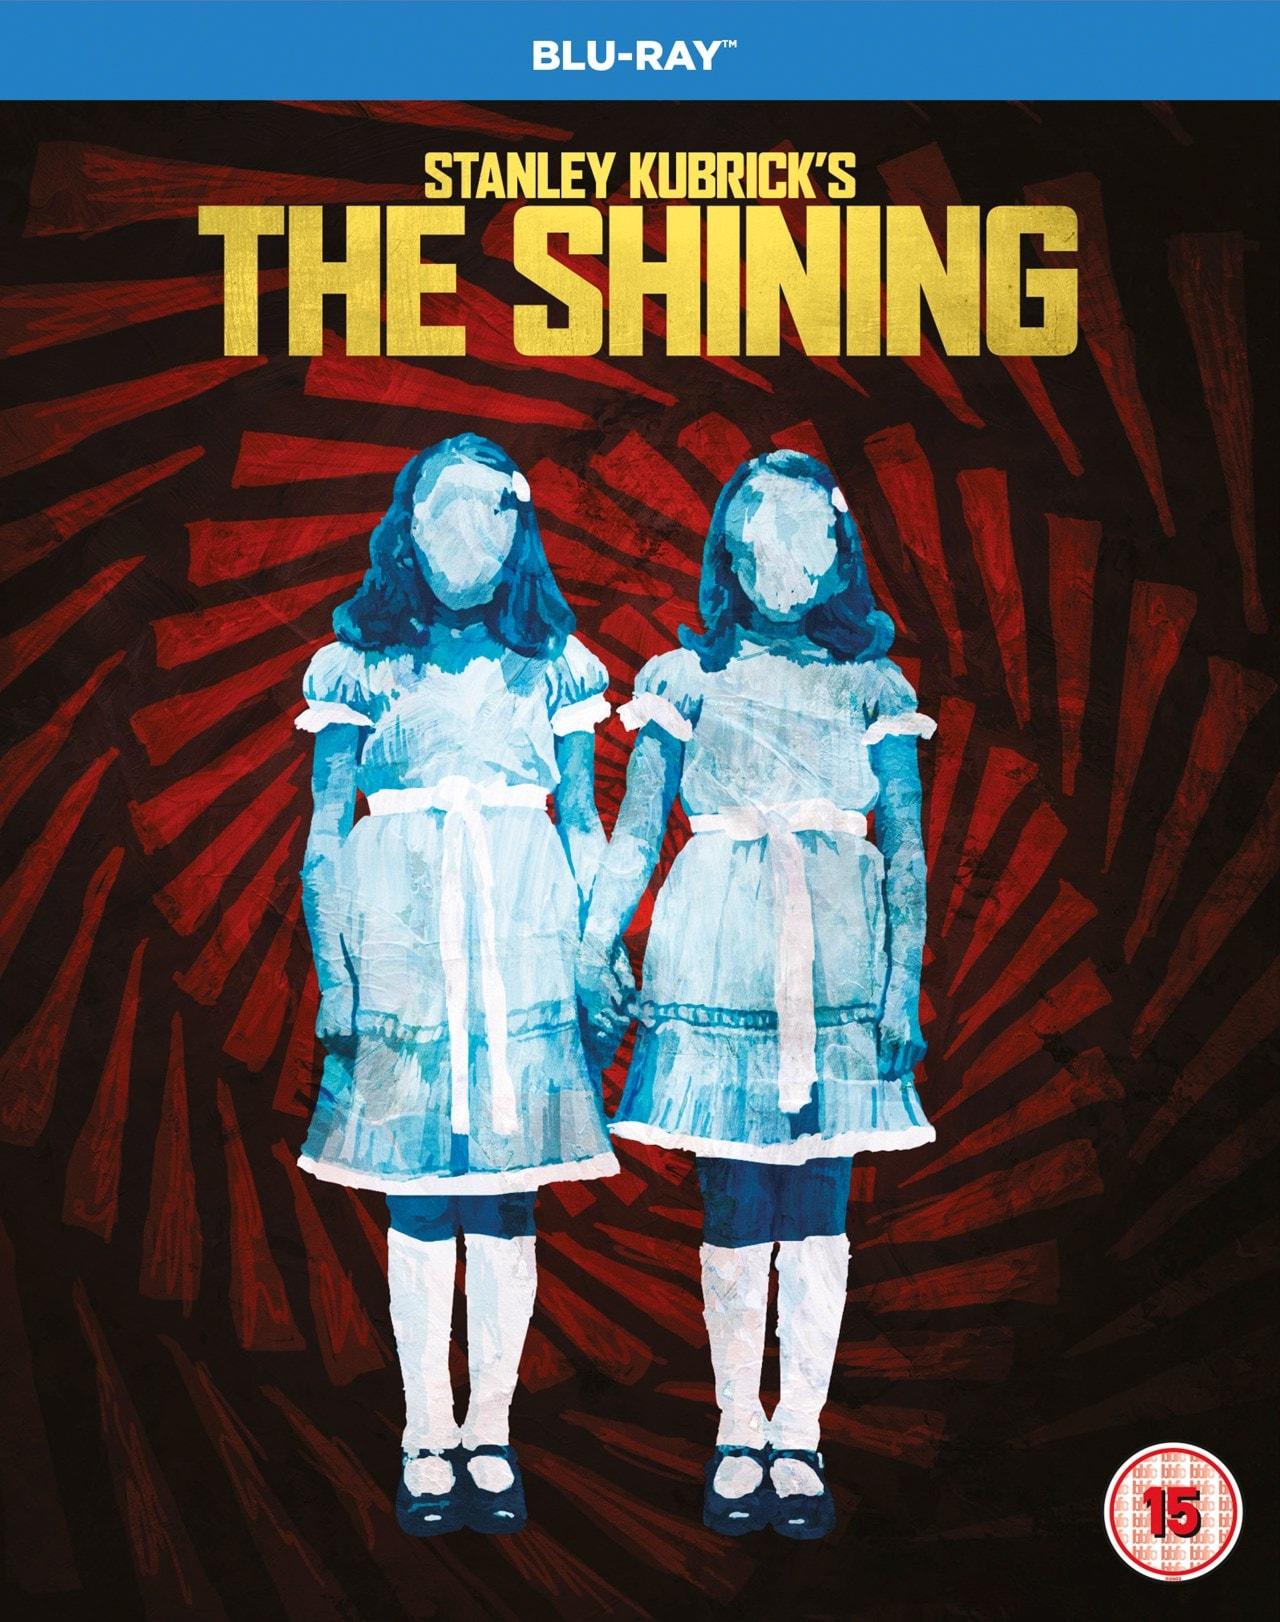 The Shining - 1